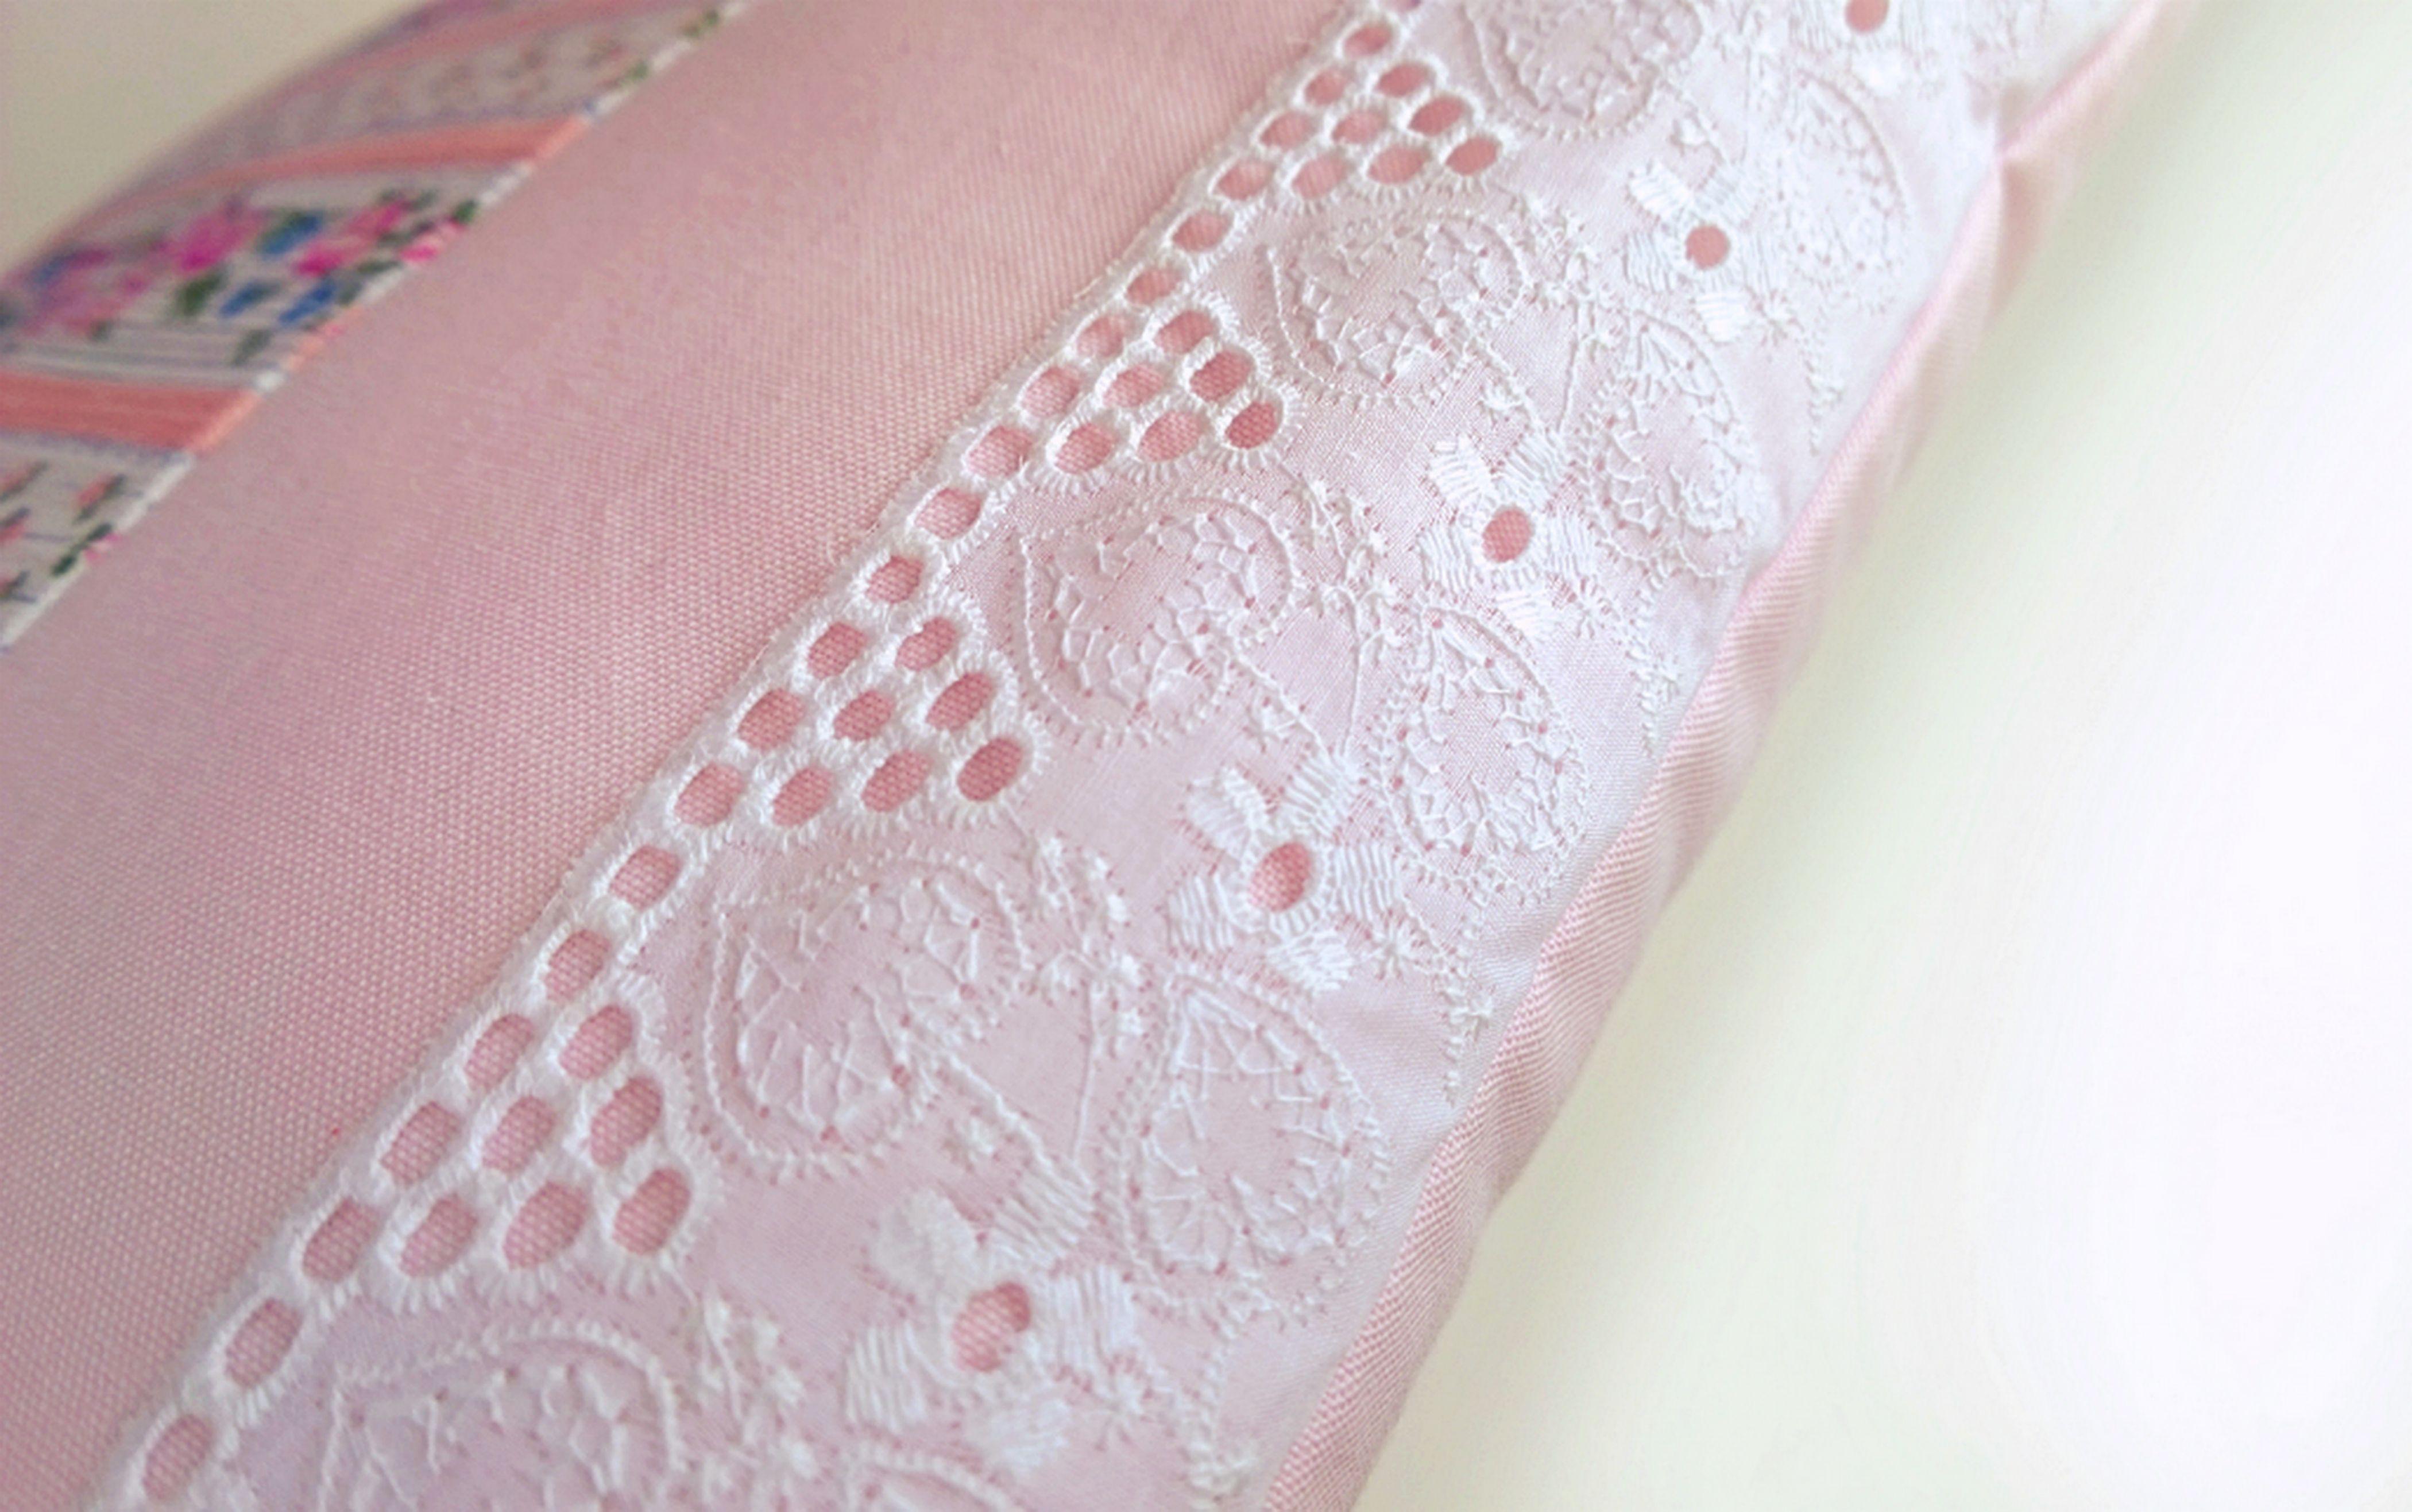 Pin by polotno mokoshi on vintage cotton shabby chic pillow white